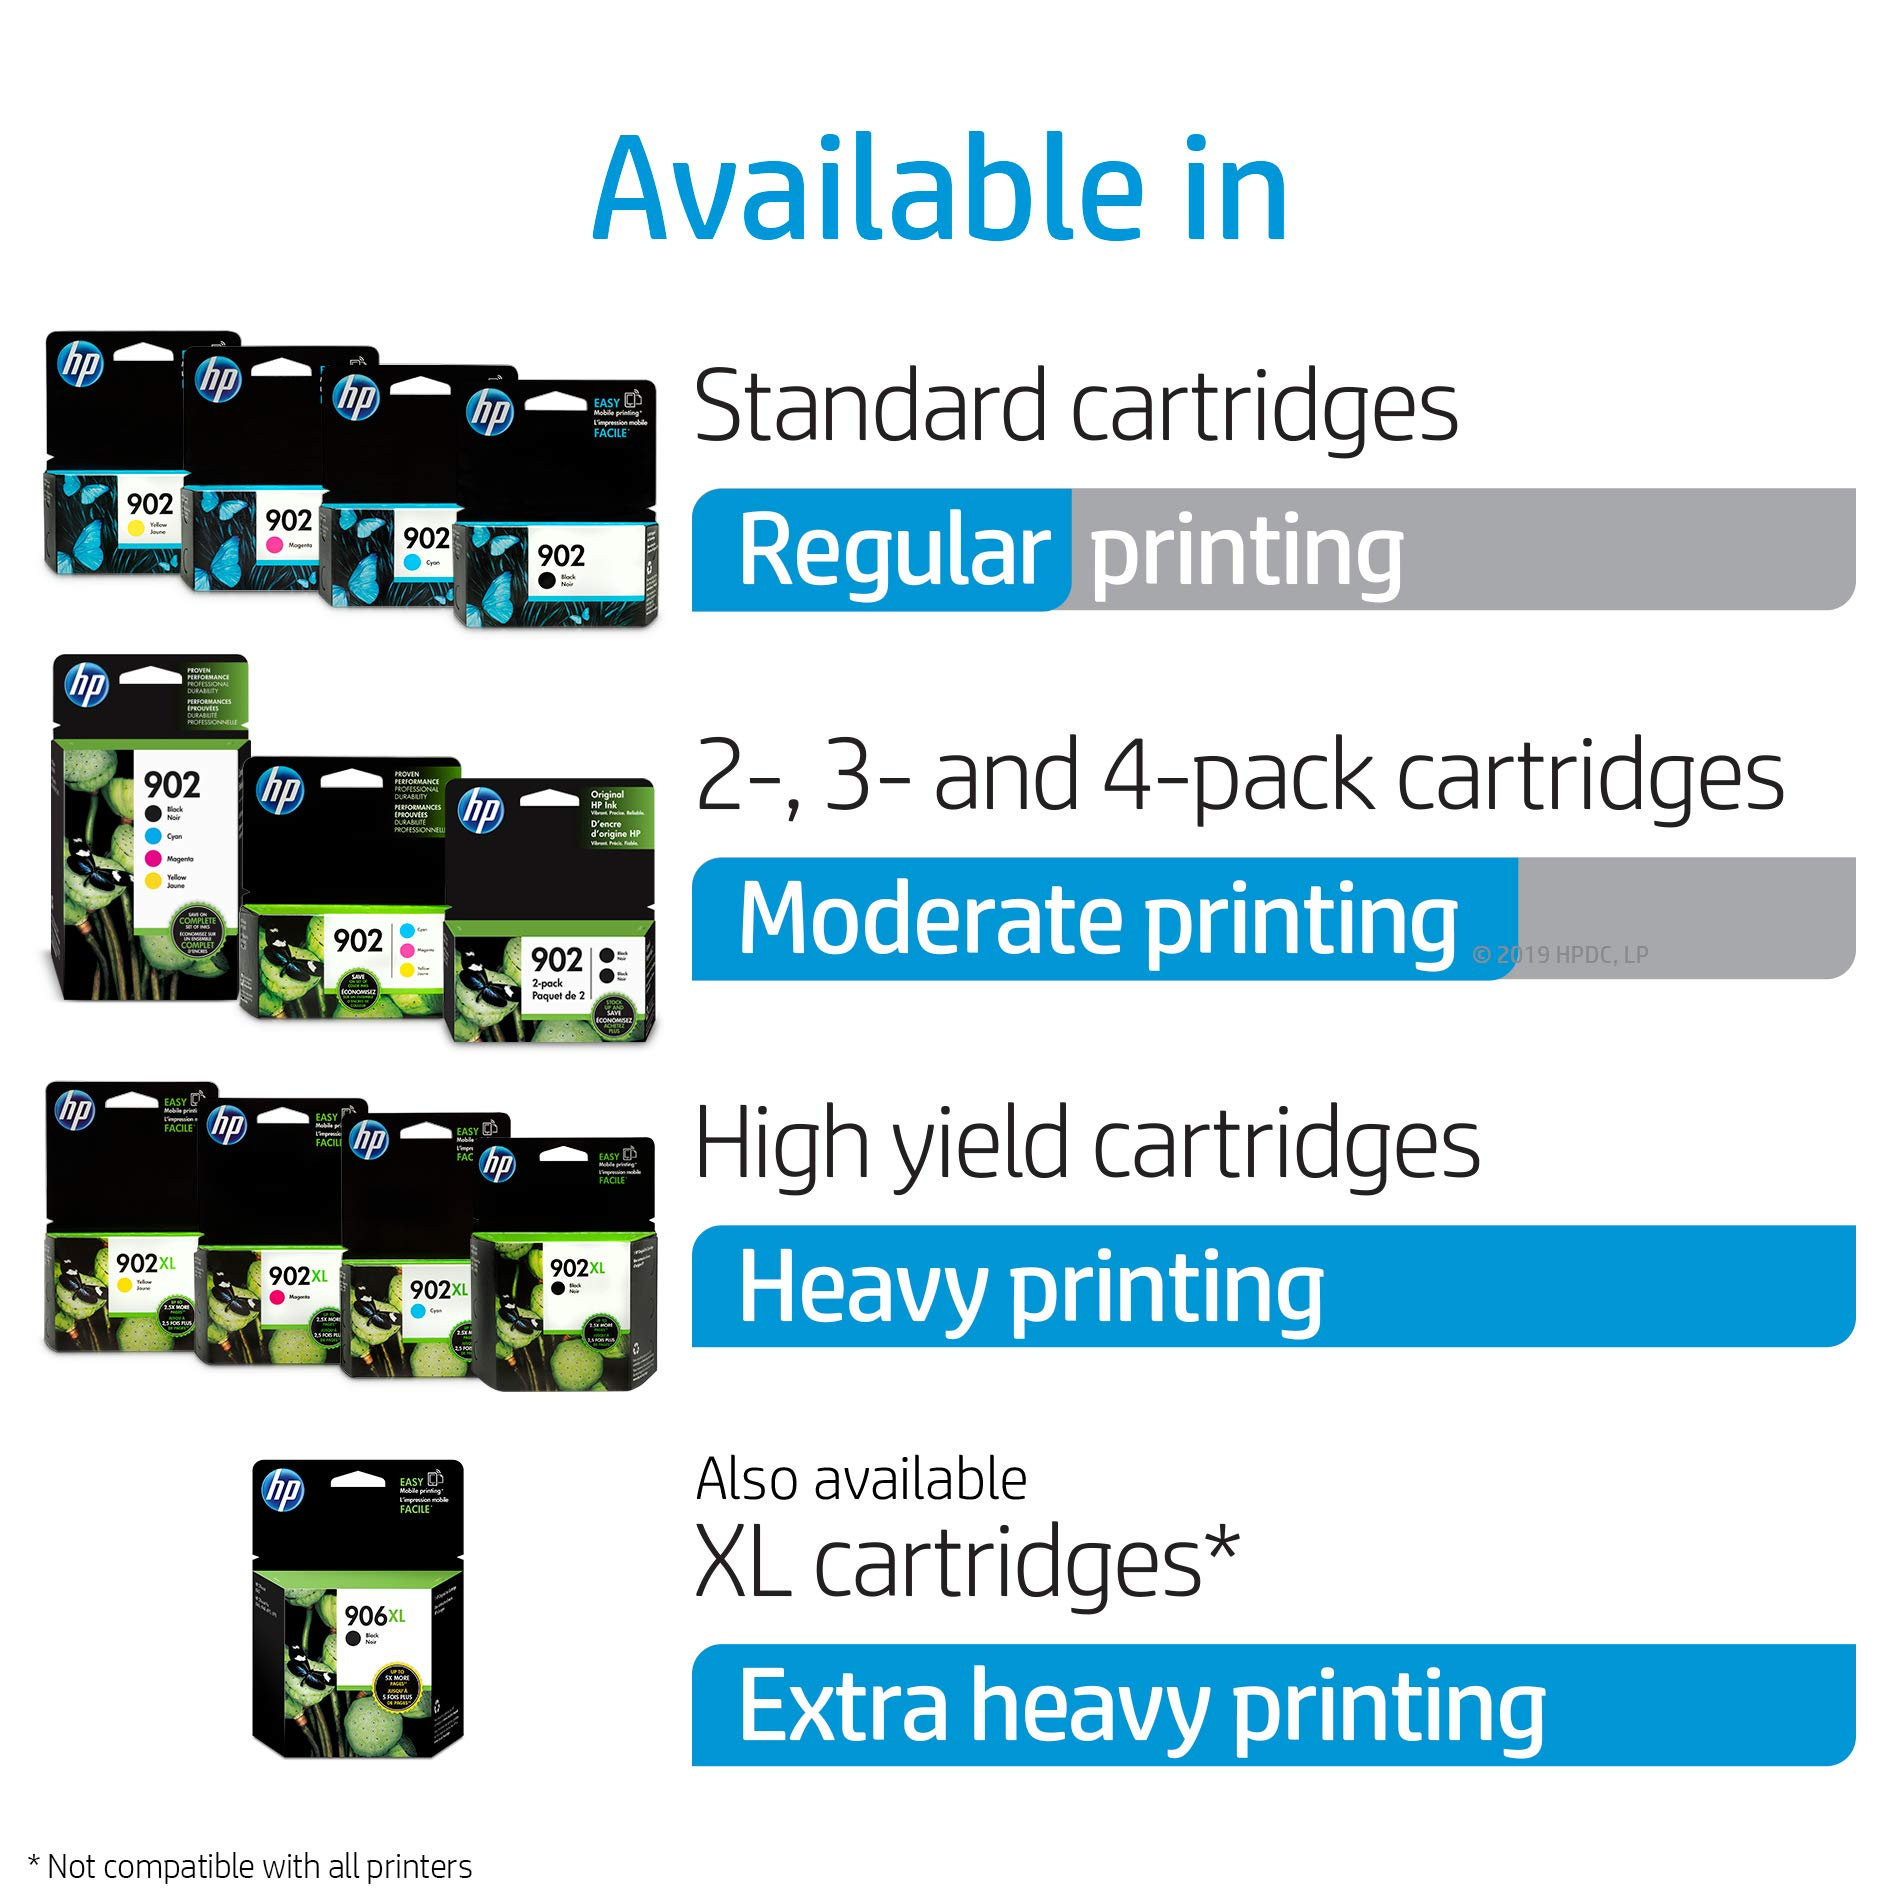 HP 902 Black, Cyan, Magenta & Yellow Ink Cartridges, 4 Cartridges (T6L98AN, T6L86AN, T6L90AN, T6L94AN) by HP (Image #3)